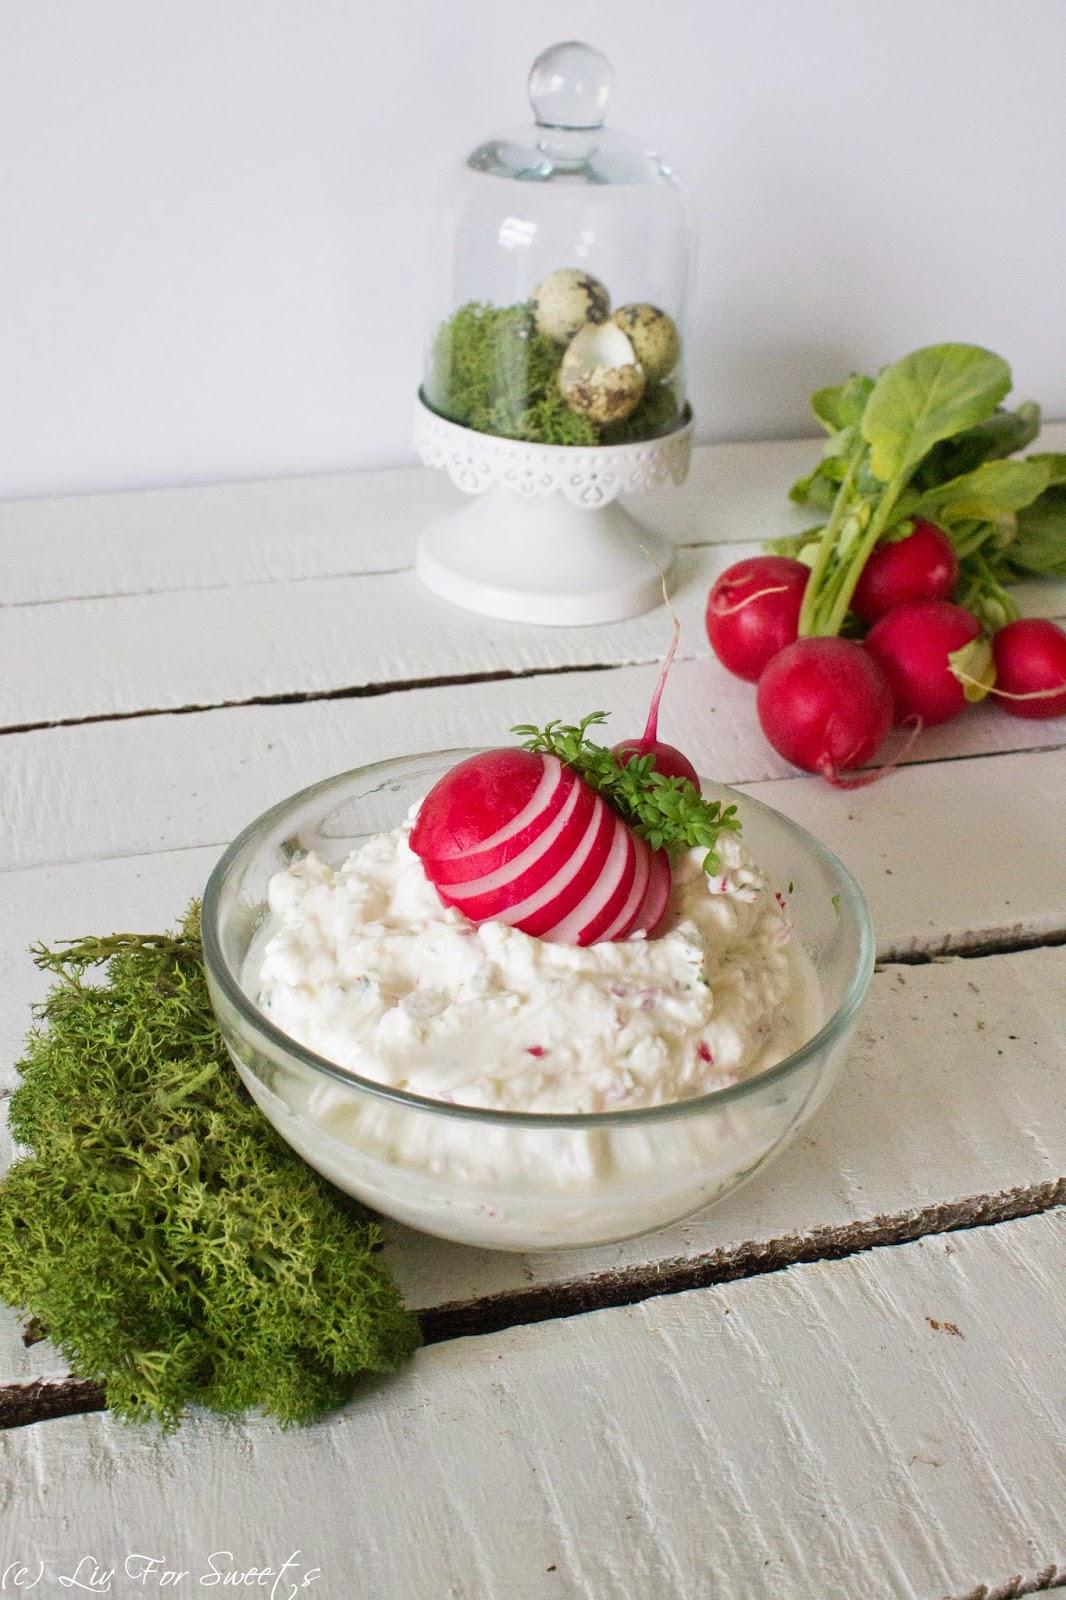 Radieschen Kresse Frischkäse, Frühstück, Osterfrühstück, Ostern, Rezept, Thermomix